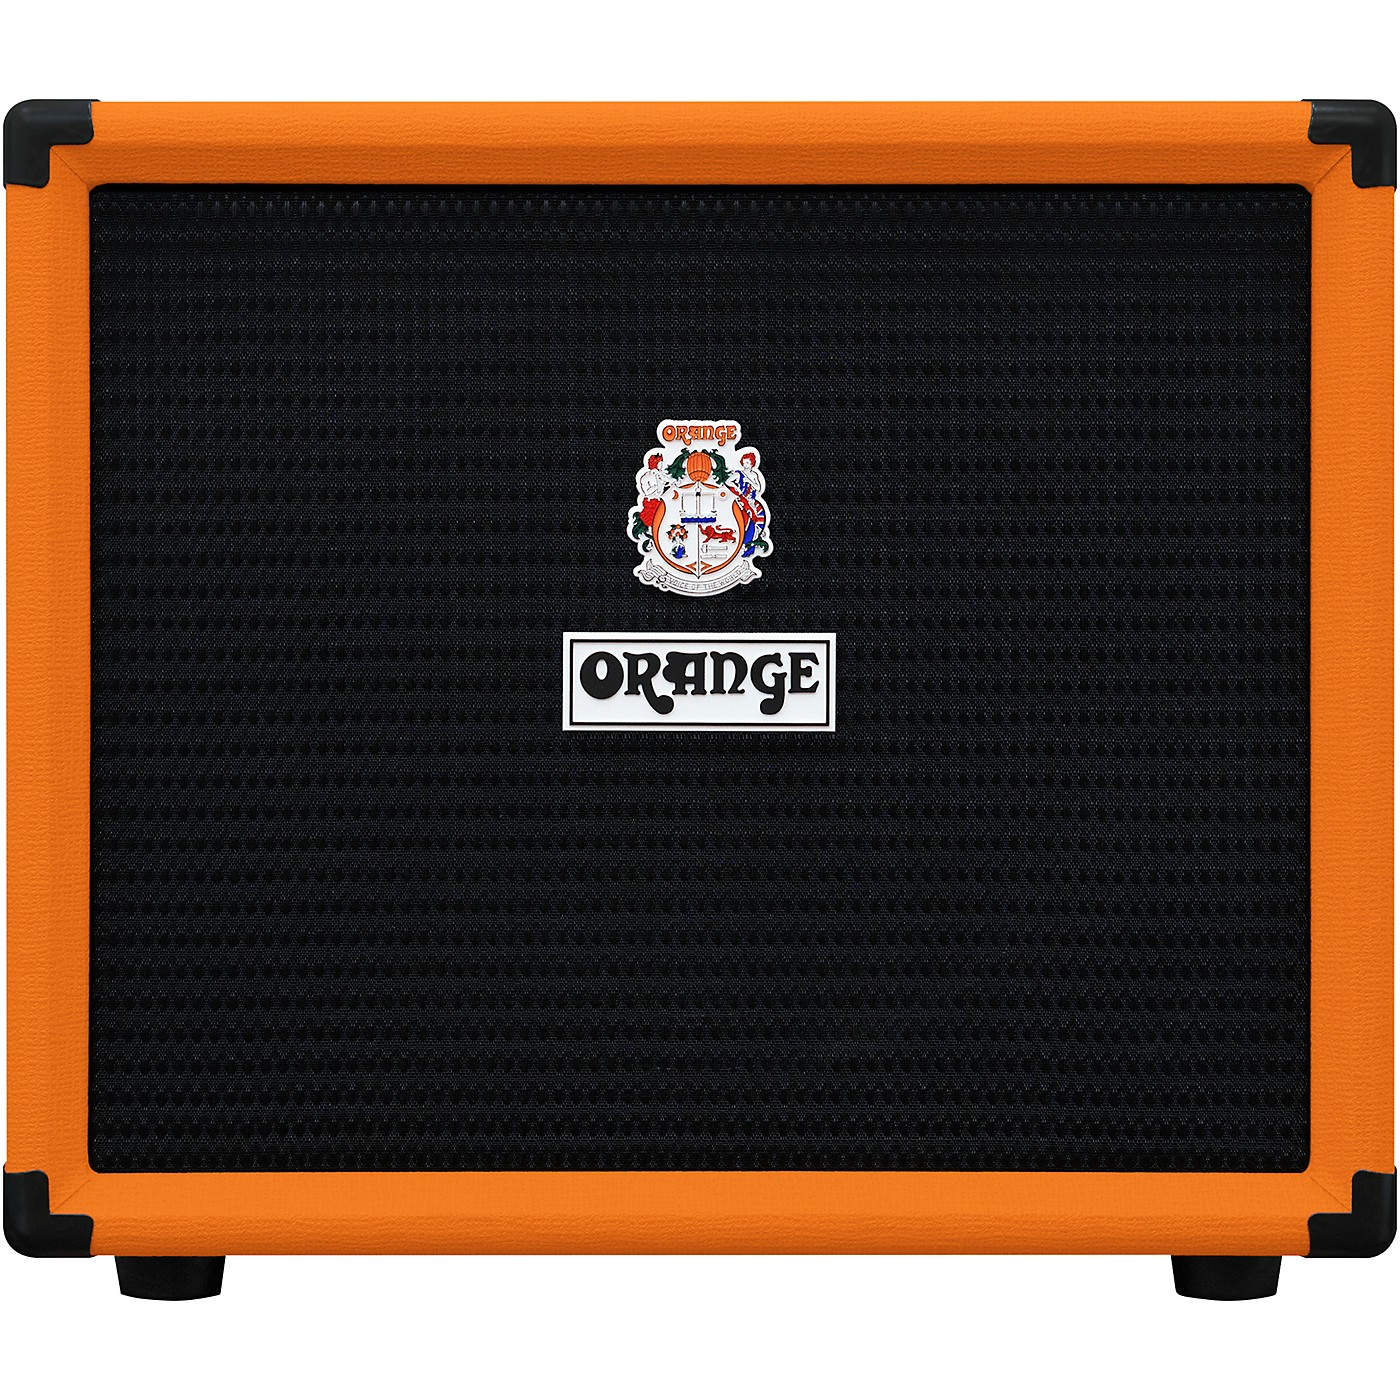 Orange Amplifiers OBC112 400W 1X12 Bass Speaker Cabinet thumbnail